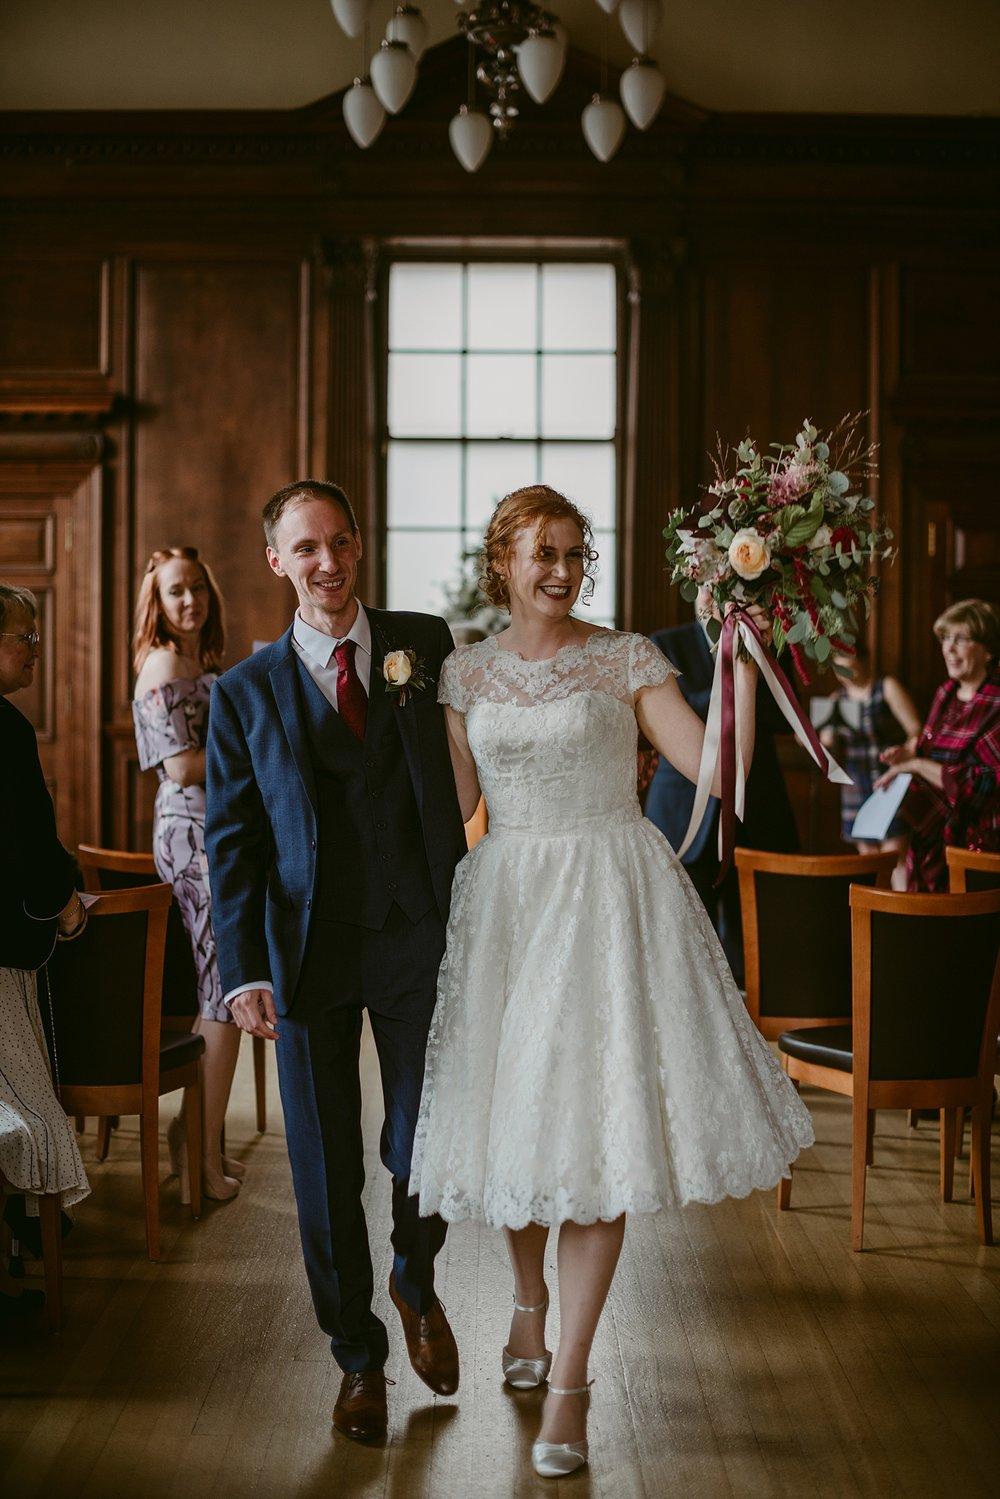 Claire-Fleck-Scottish-wedding-photography-2017__0036.jpg